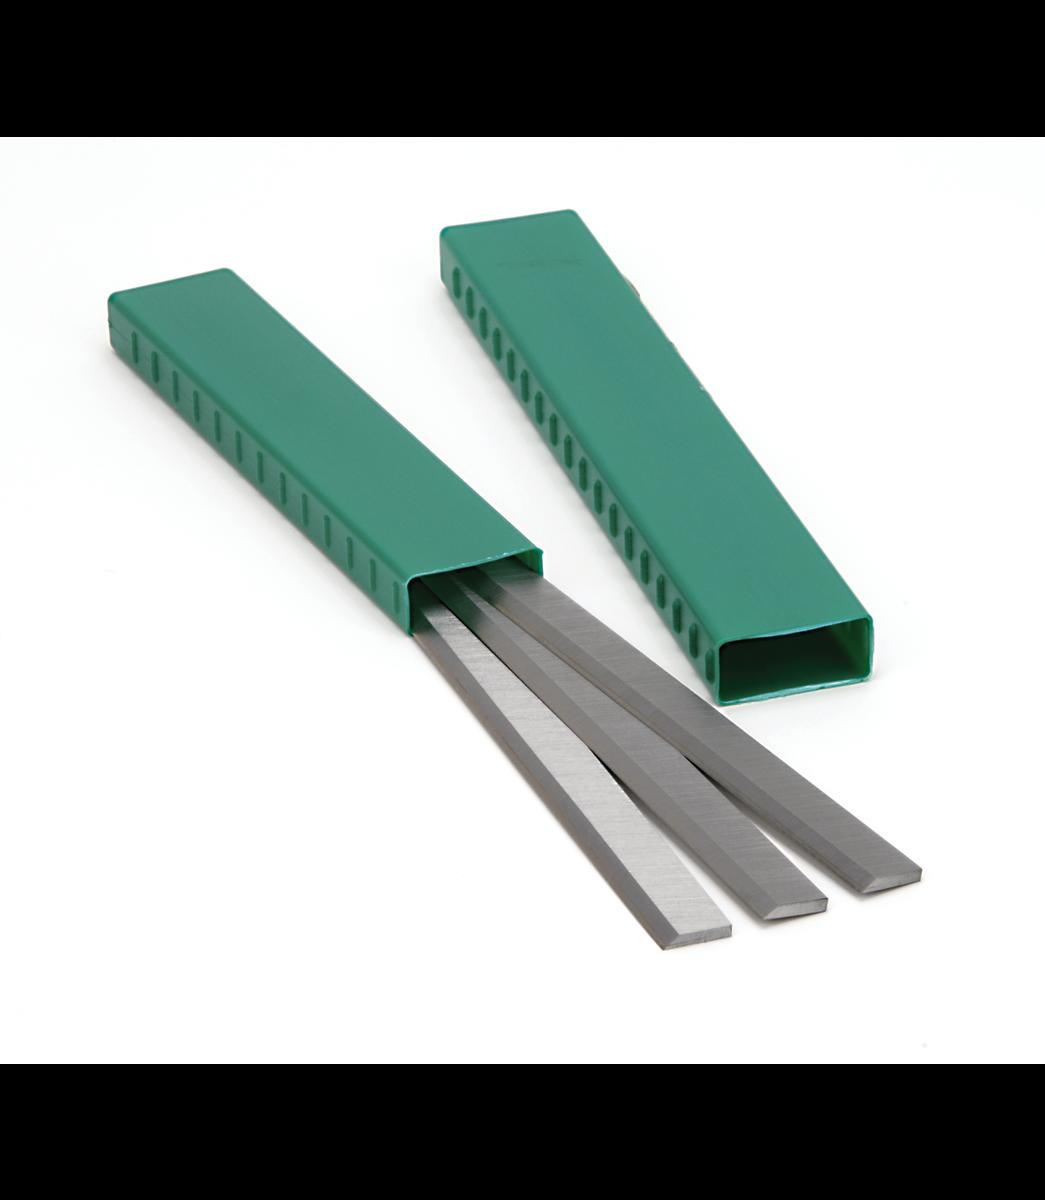 "13"" Knife Set for Jet JPM-13 Planer / Molders, JPM-13-K"